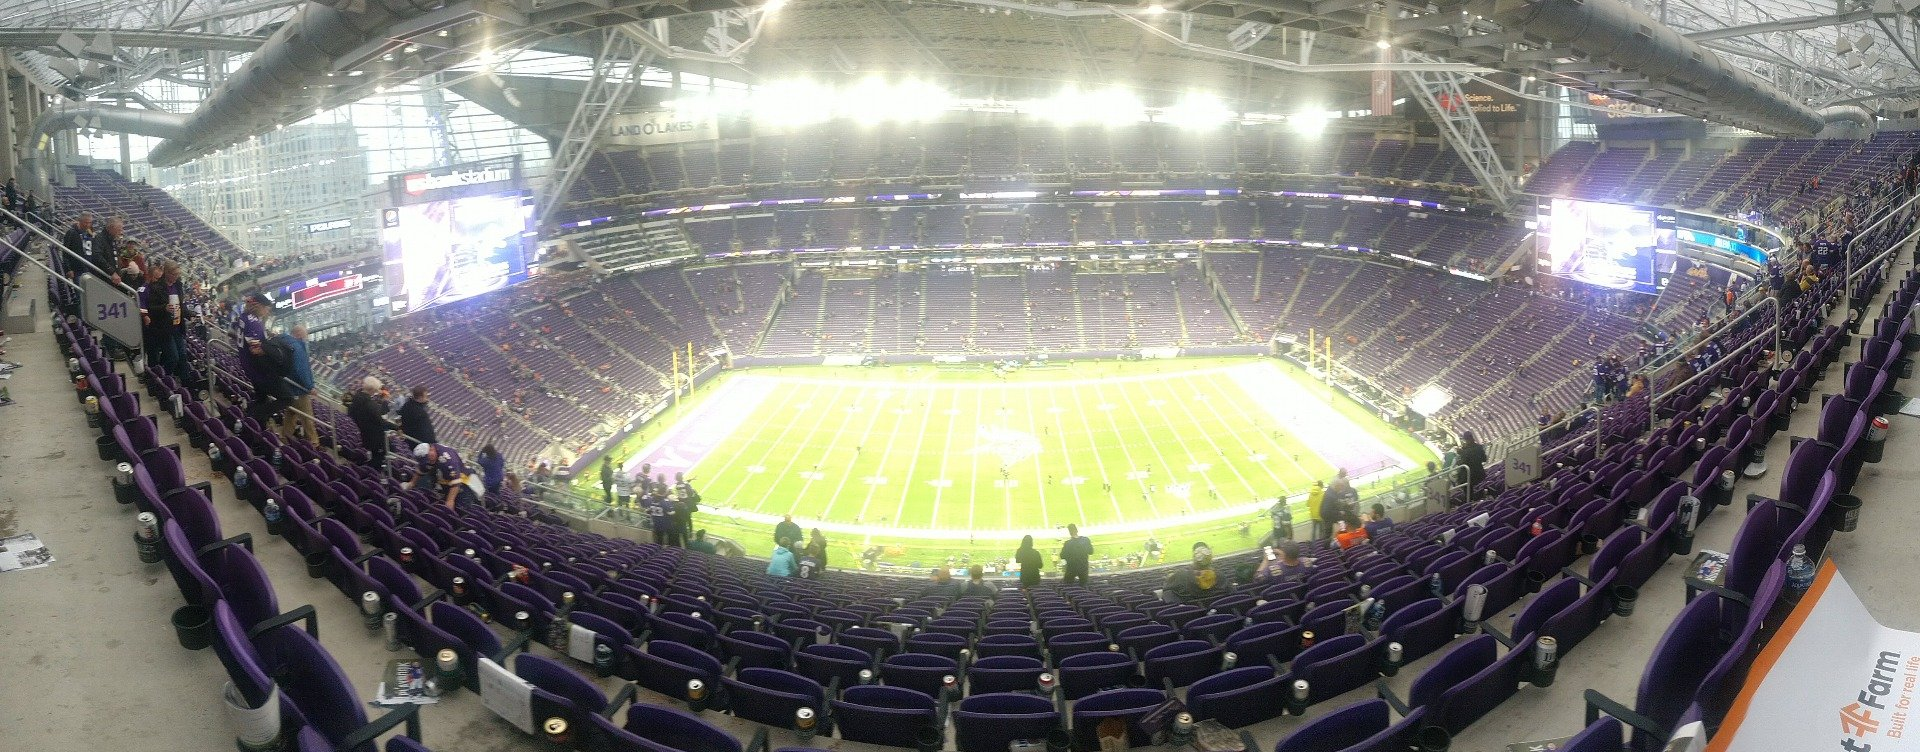 U.S. Bank Stadium Section 341 Row 16 Seat 14